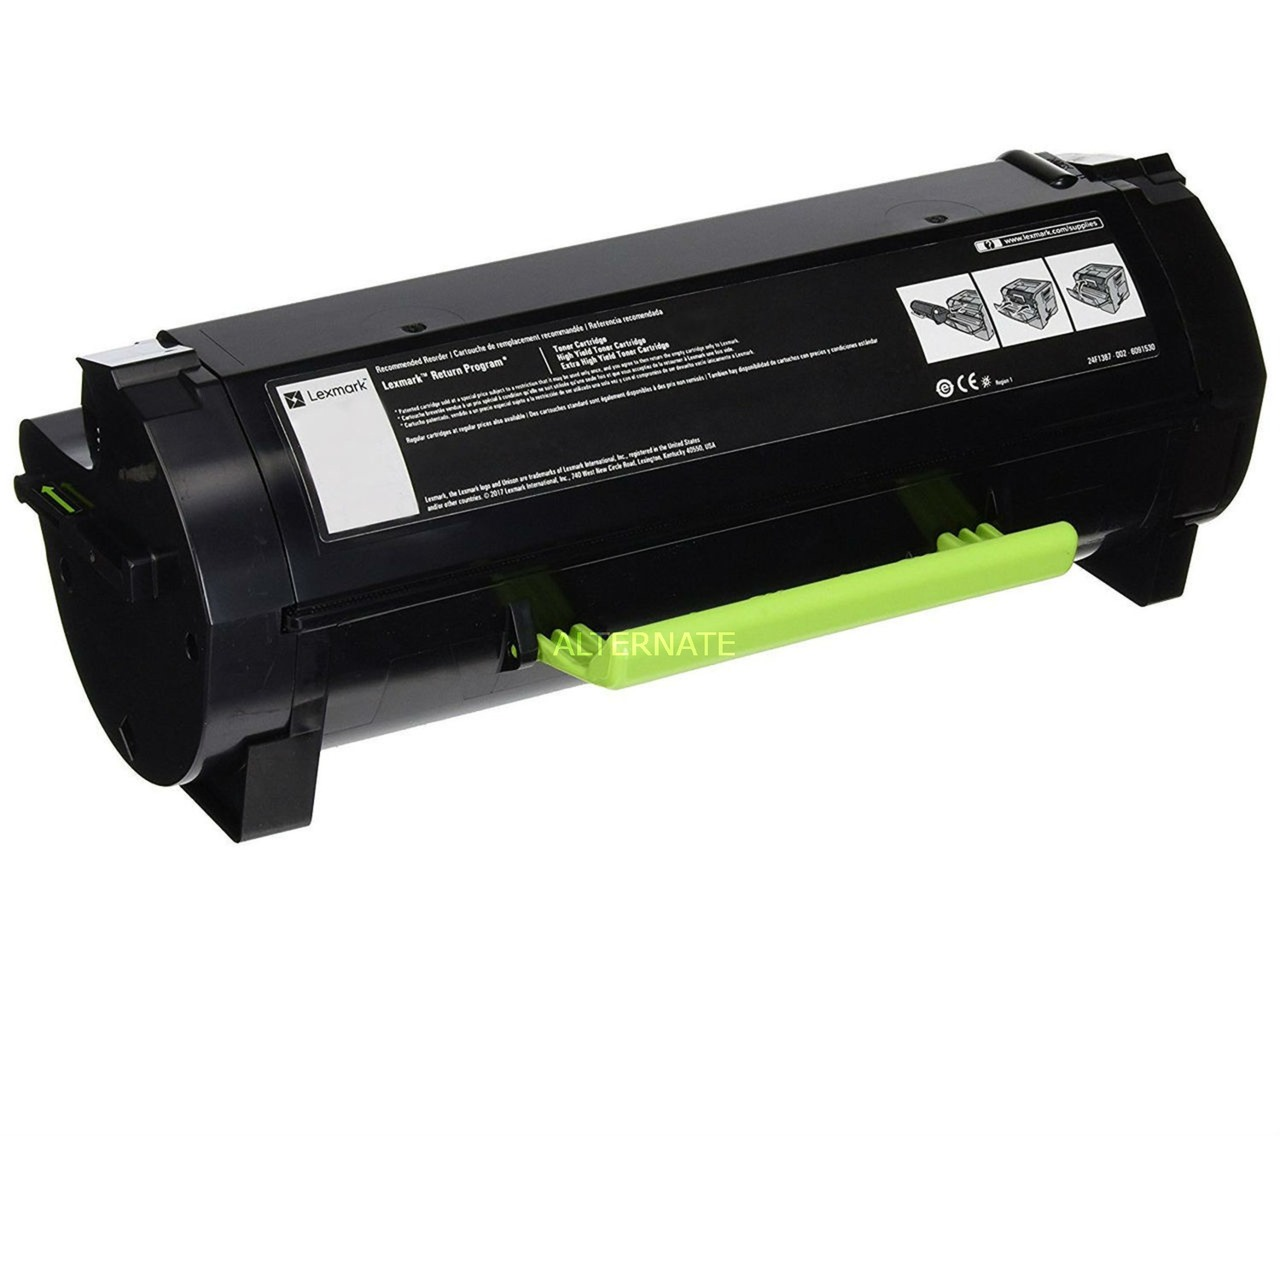 51B0HA0 Toner laser Noir cartouche toner et laser